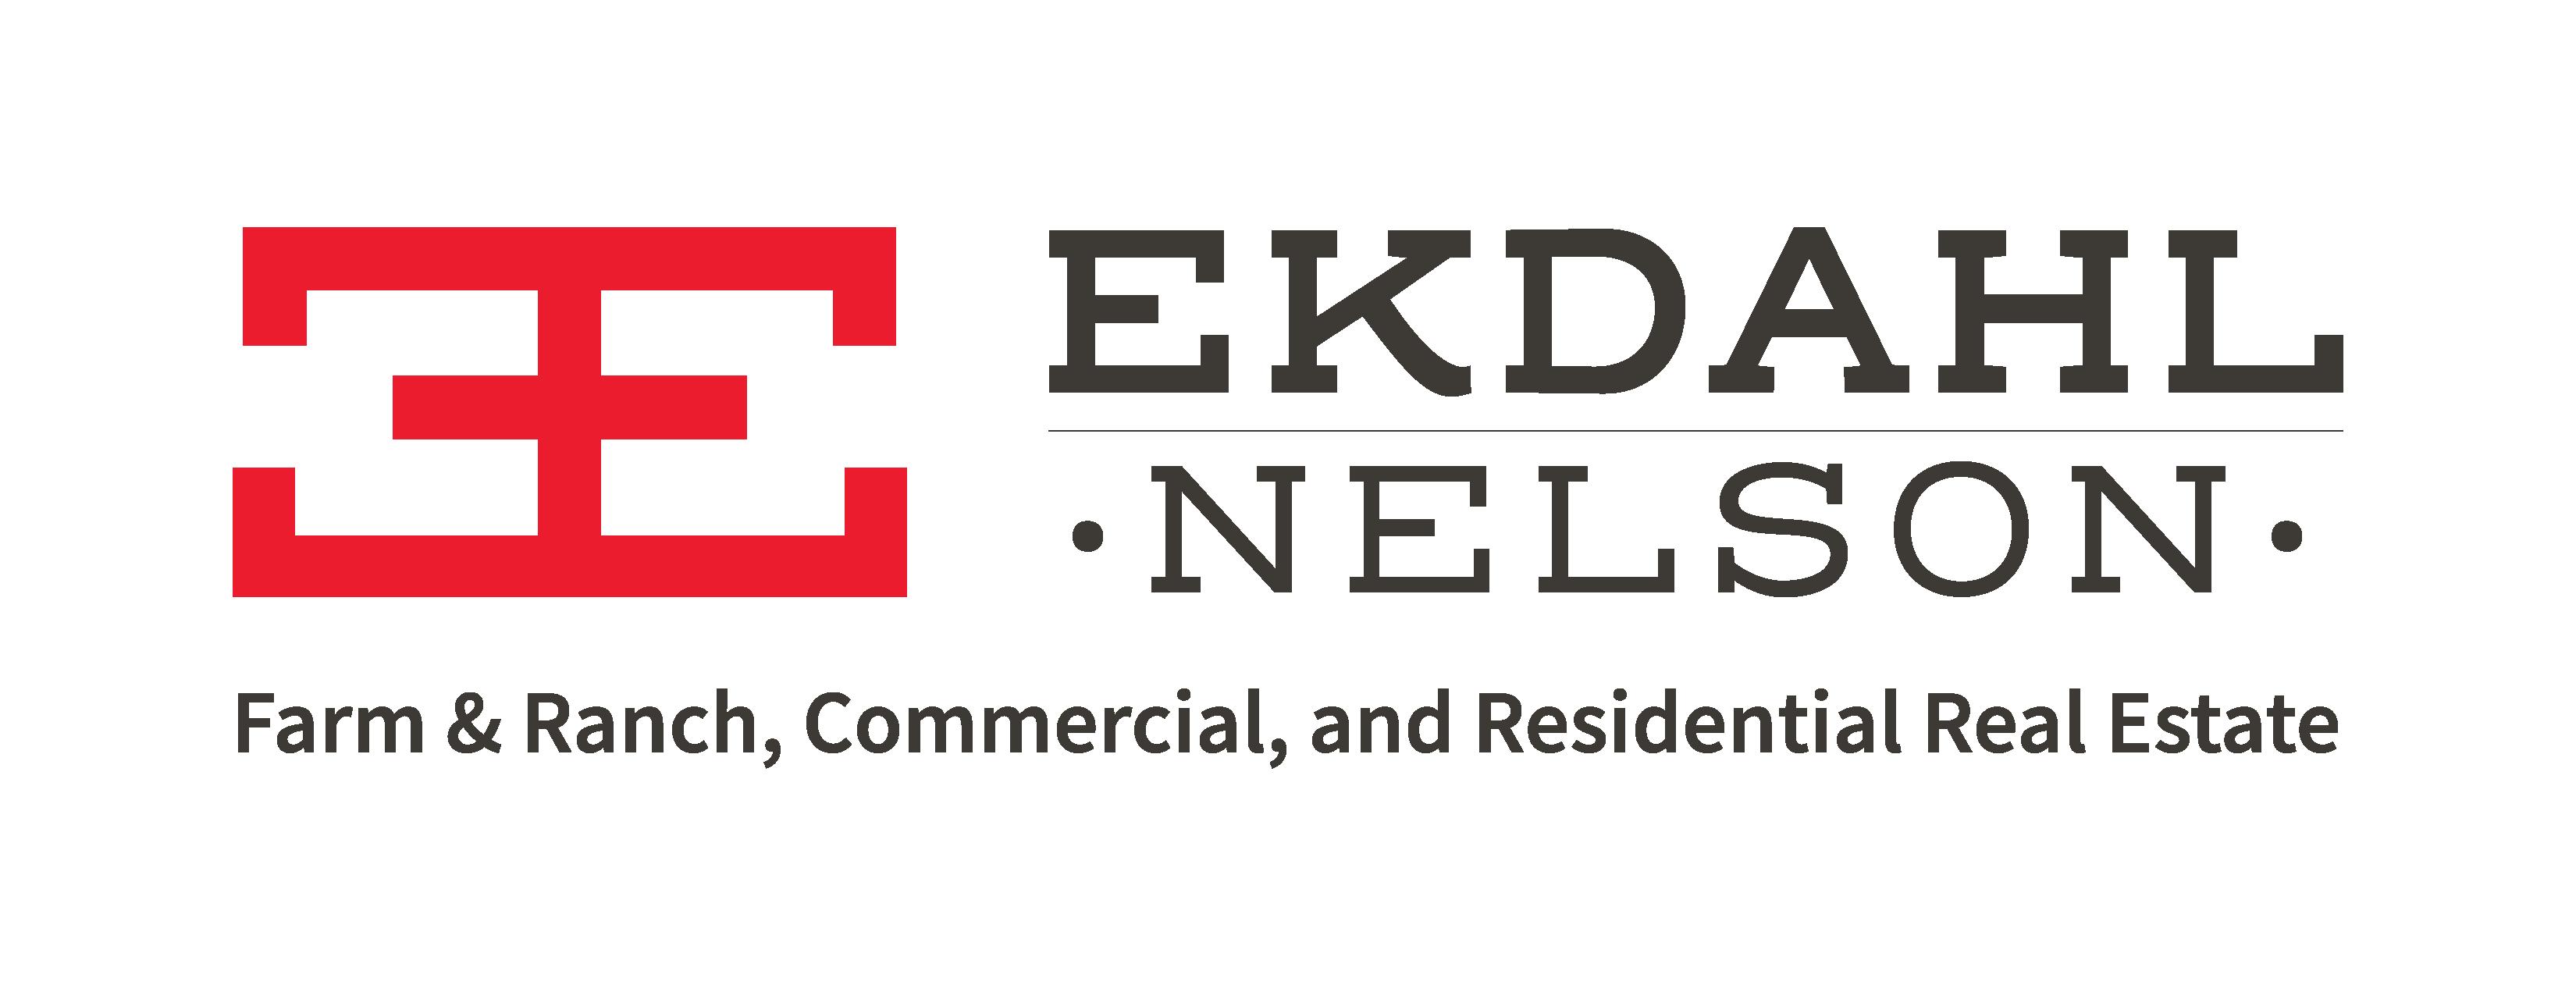 Ekdahl Nelson Tagline 01